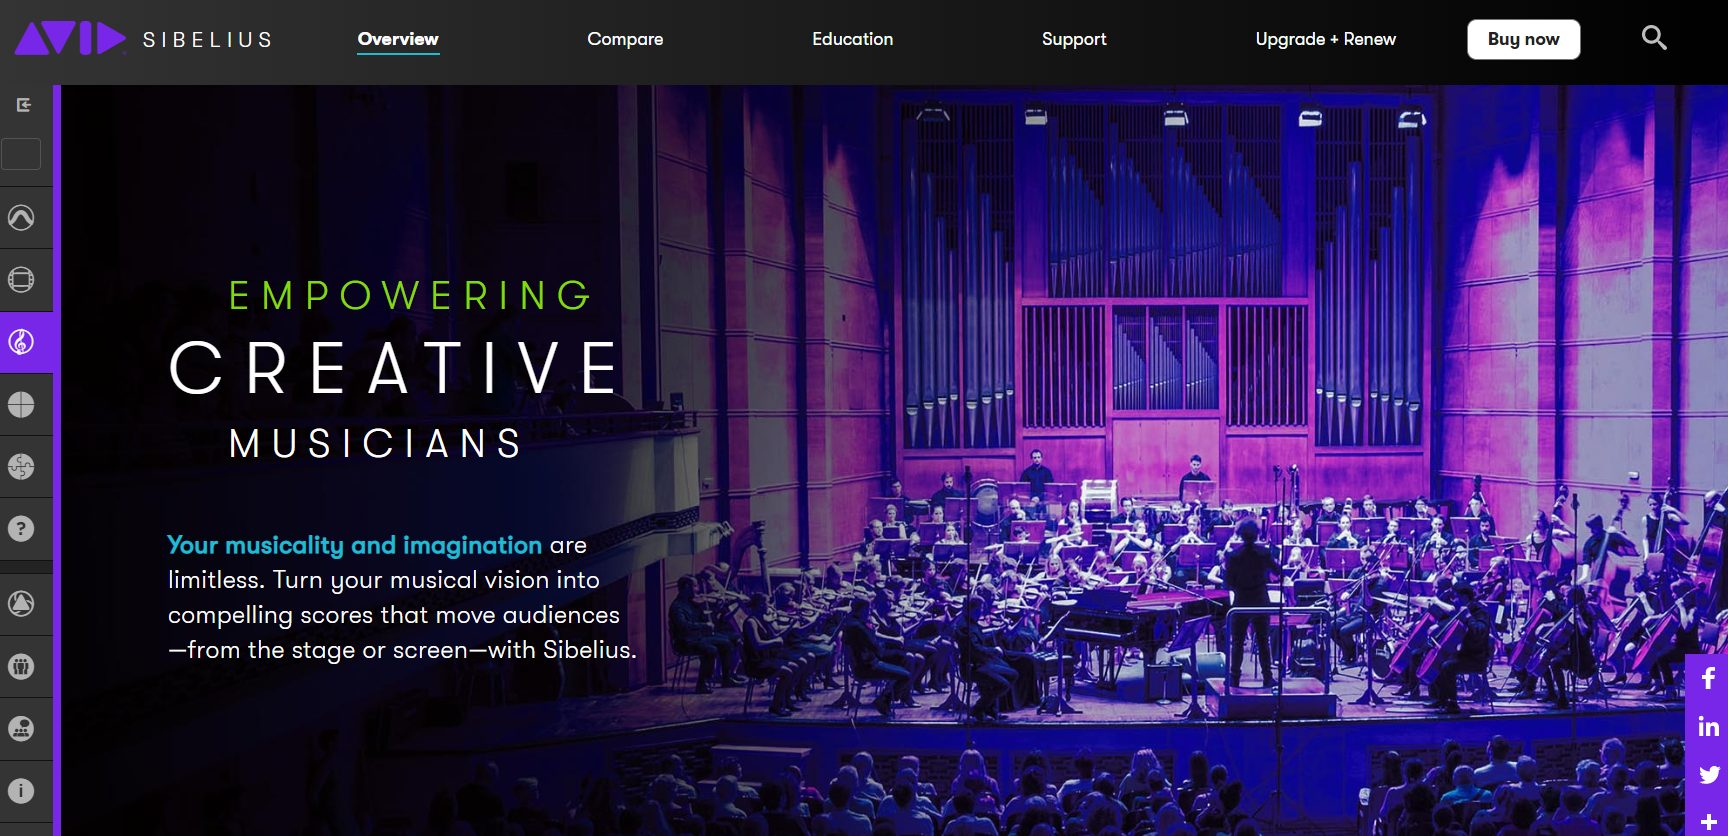 Avid Sibelius Home Page